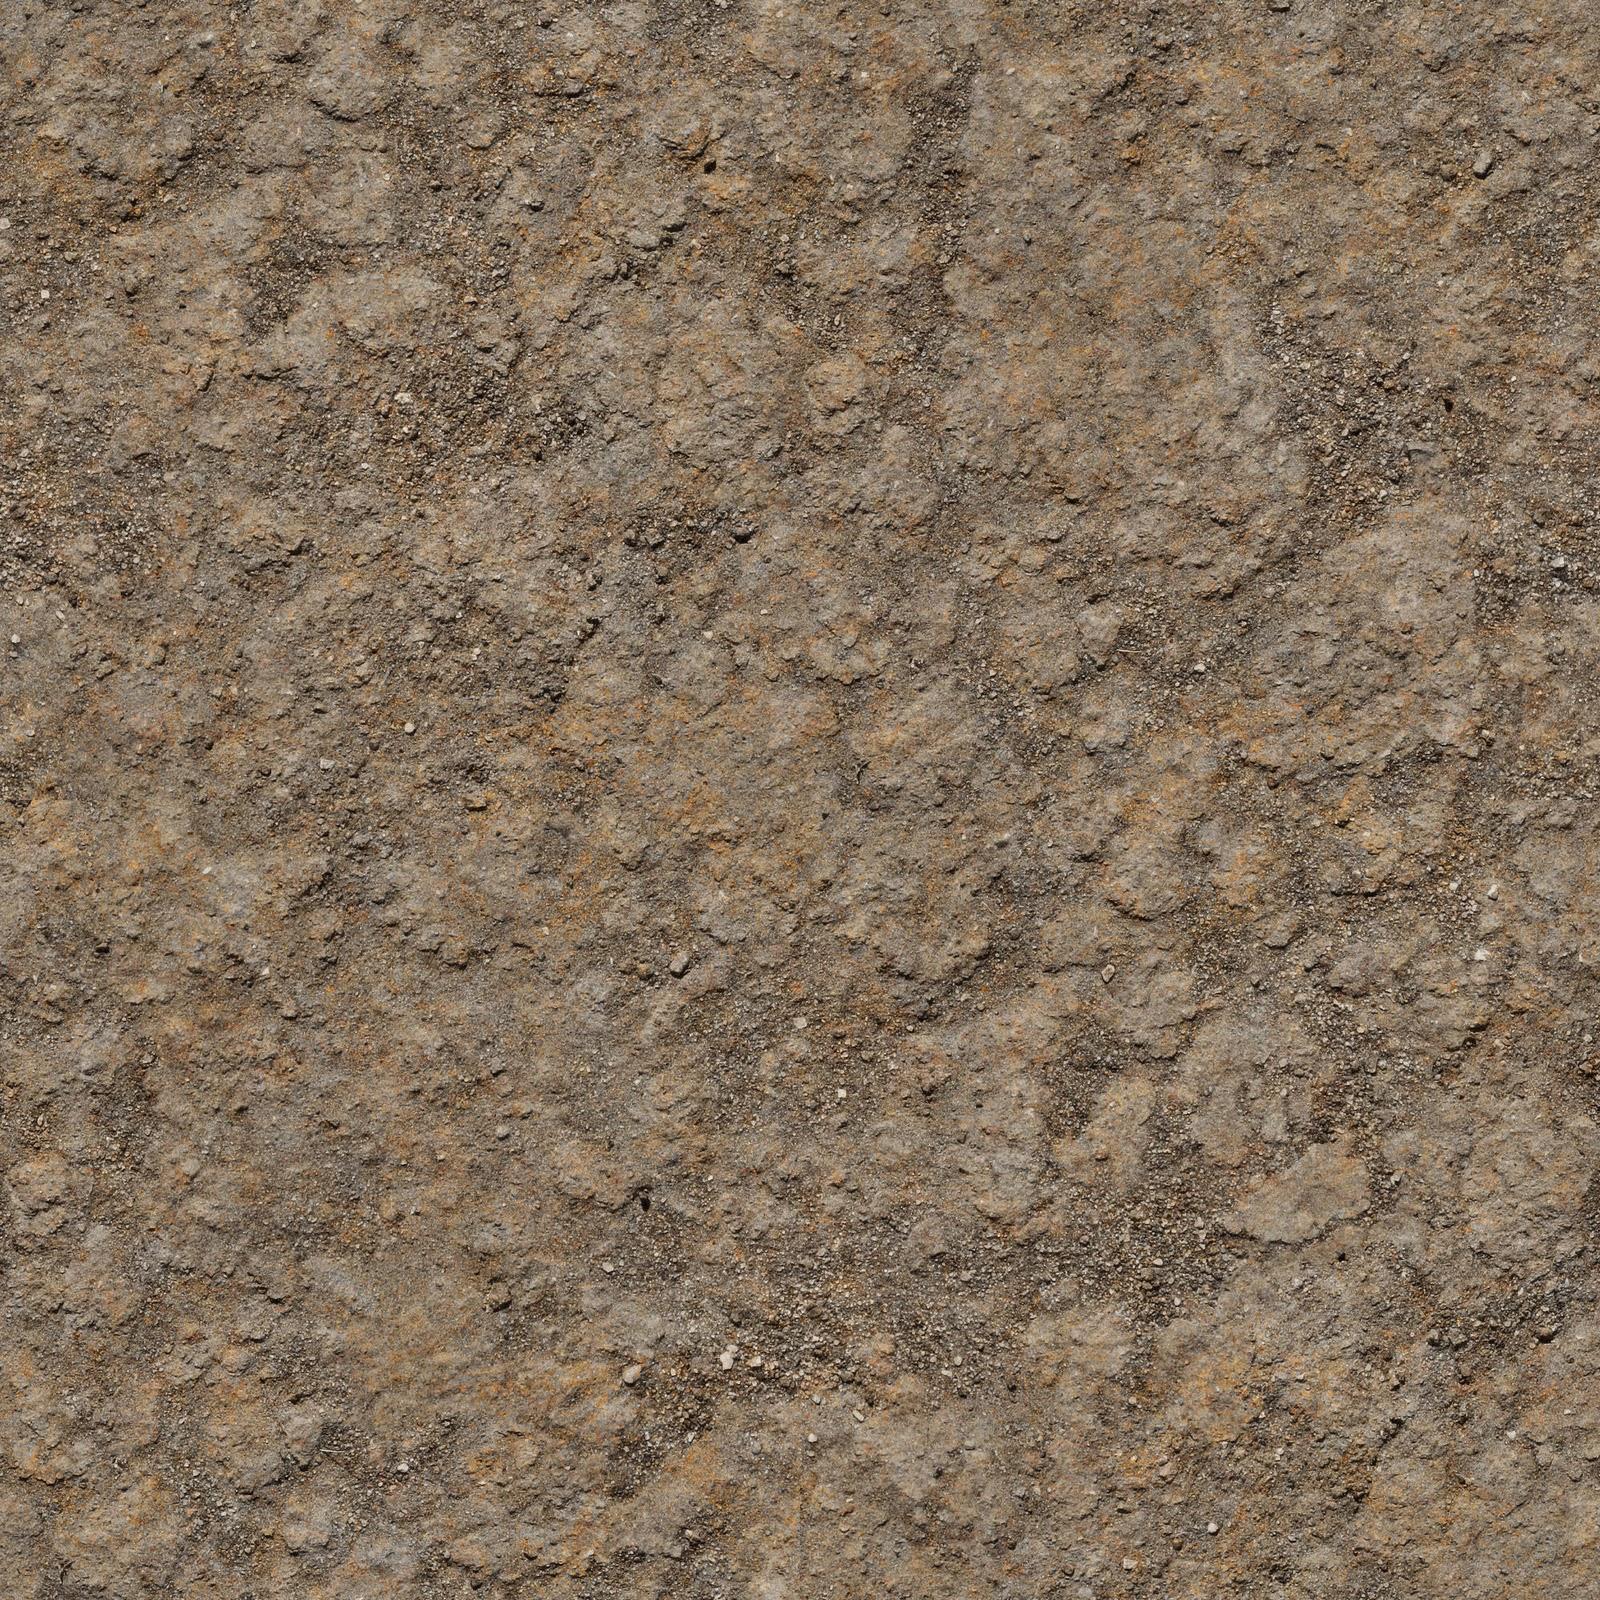 Flooring For Dirt Floor: HIGH RESOLUTION SEAMLESS TEXTURES: Free Seamless Ground